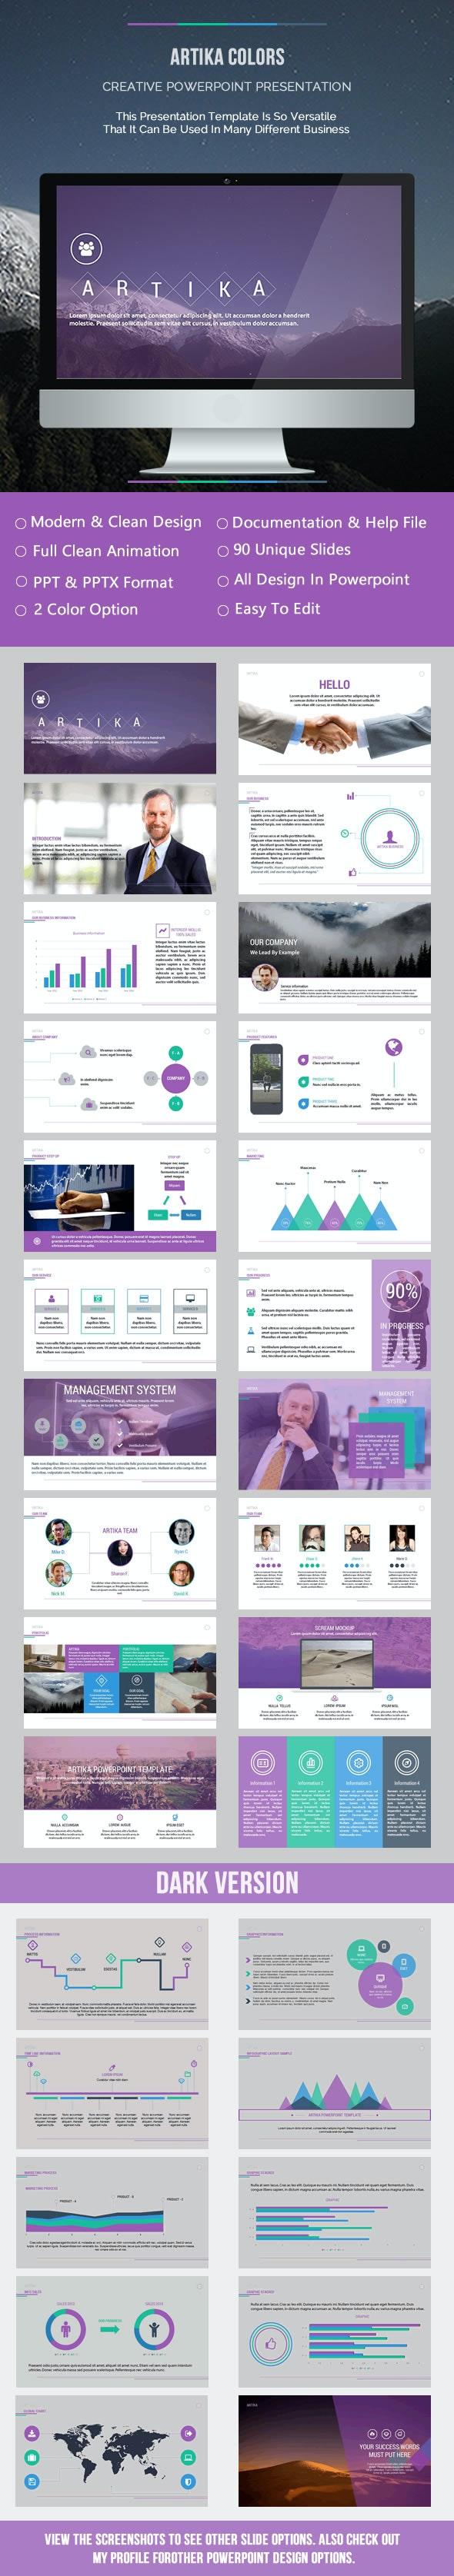 Artika Colors Presentation - Business PowerPoint Templates